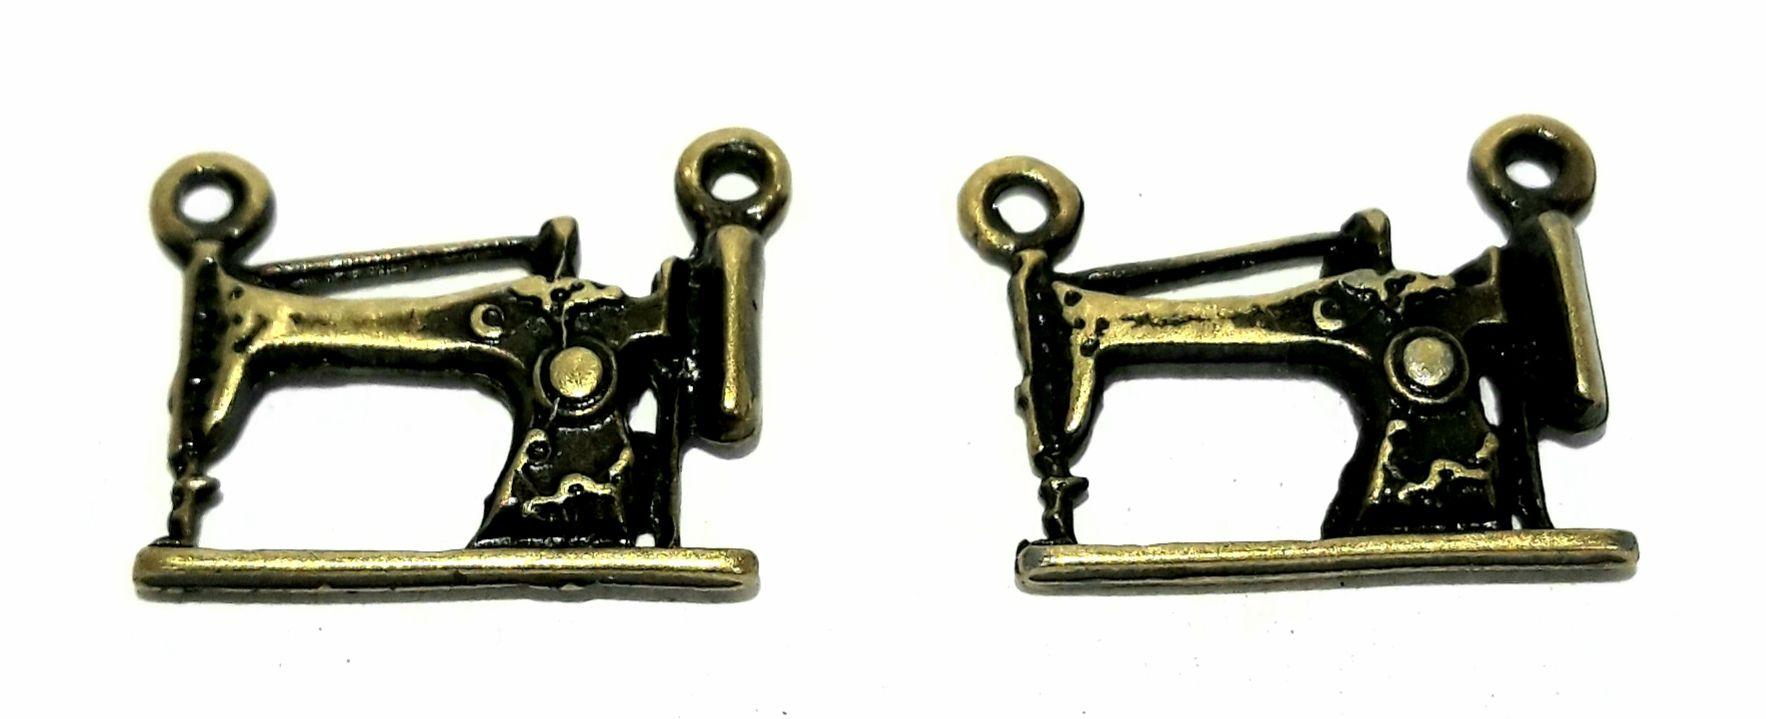 Pingente Máquina de Costura (Pequena) - PINGP10